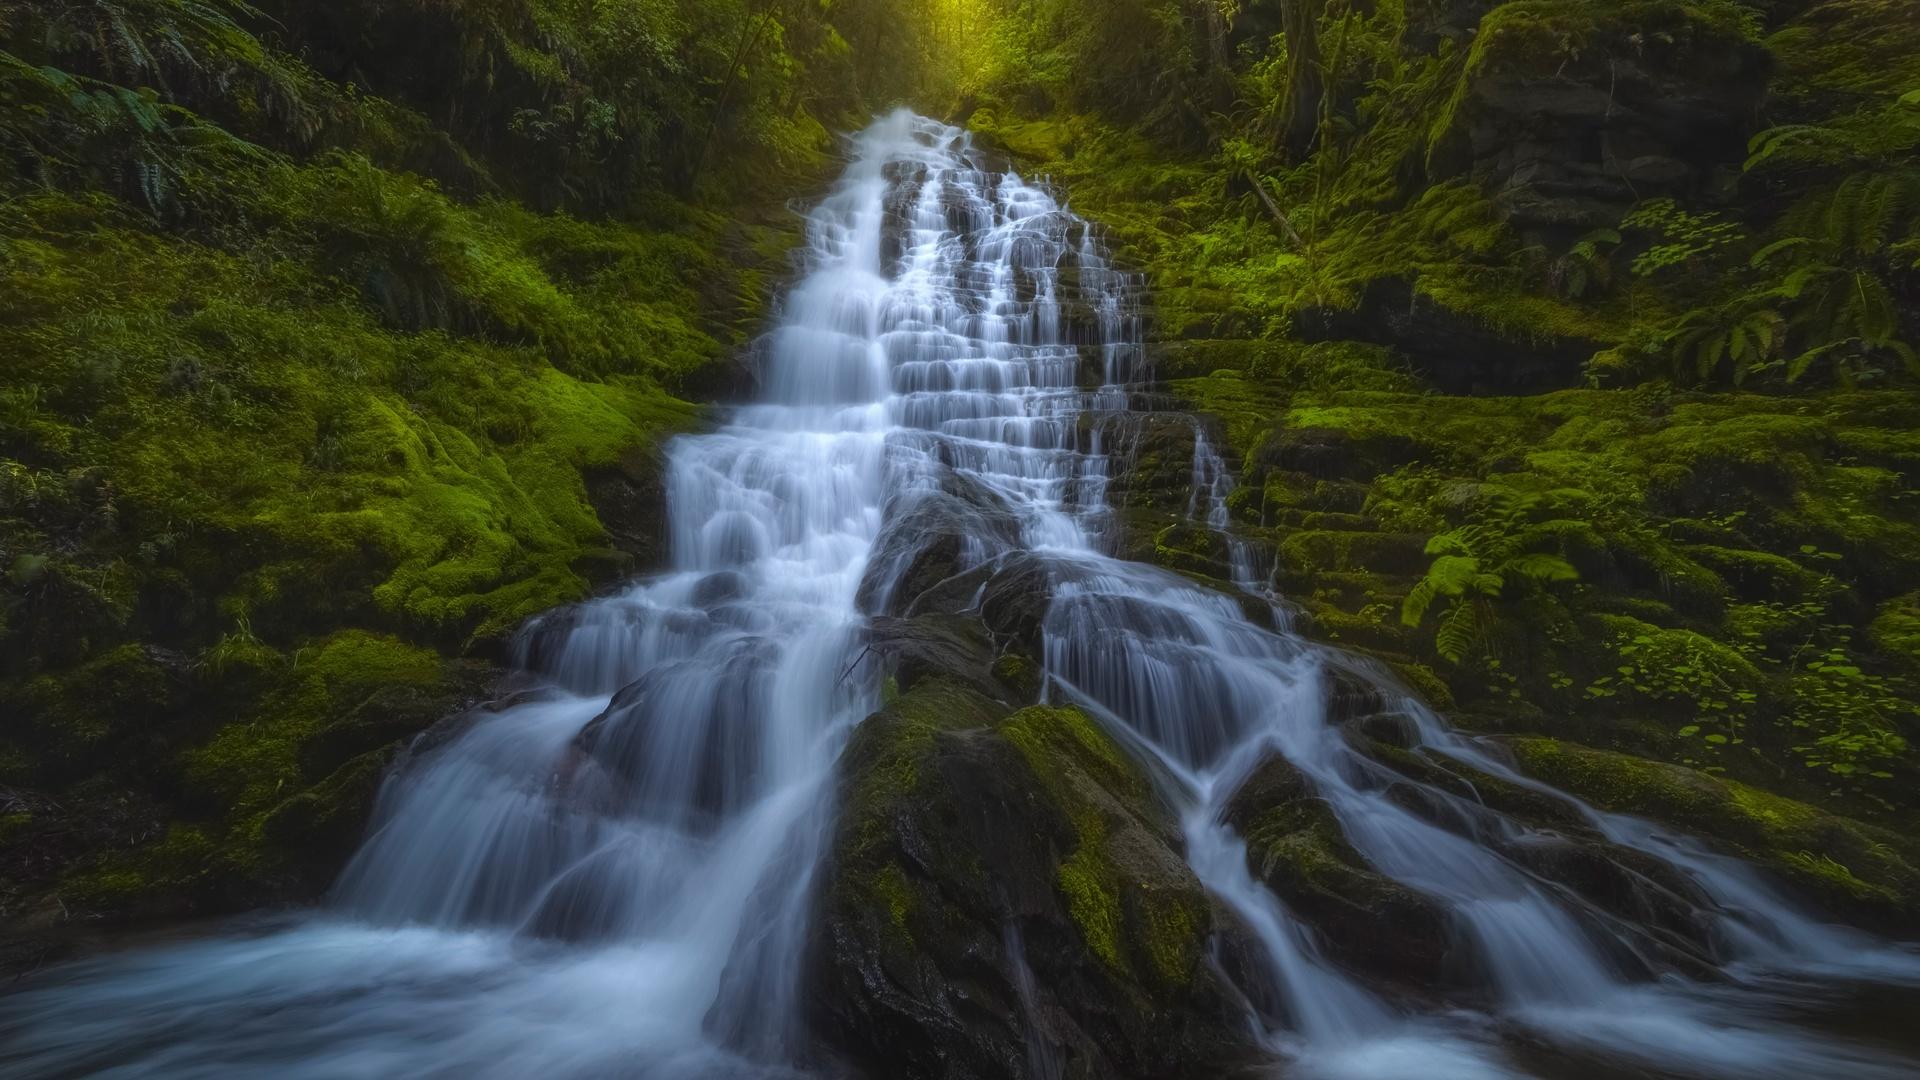 waterfall, rocks, forest, green trees, waterfall, mountains, washington state